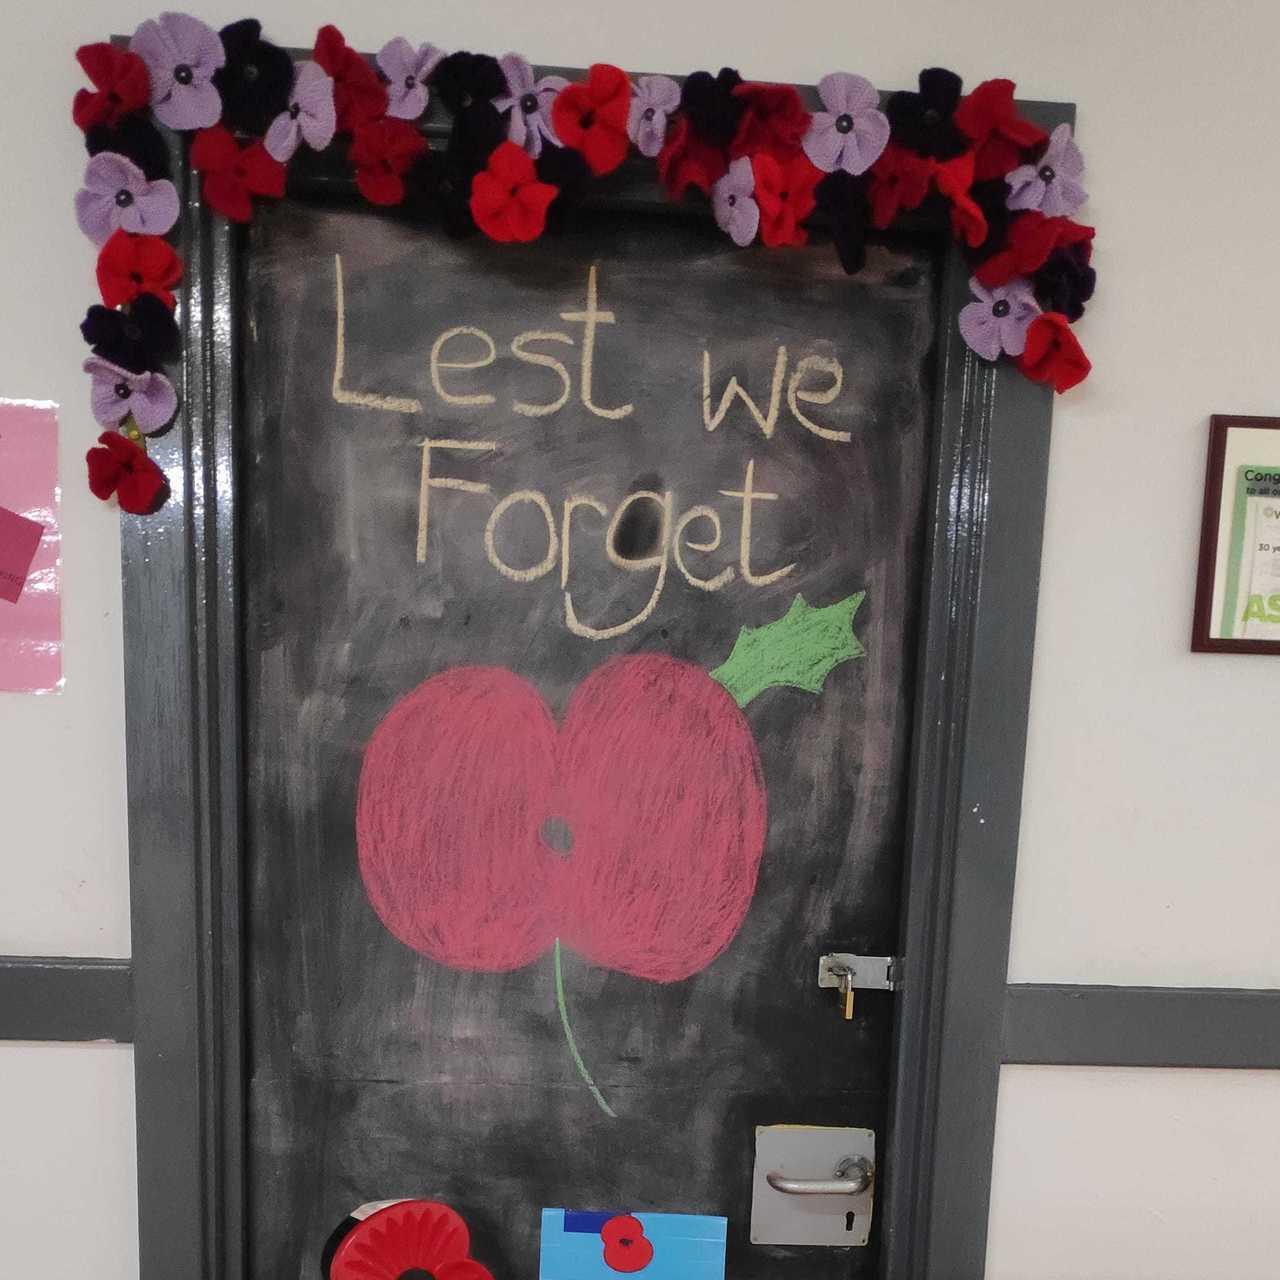 Lest we forget | Asda Watford